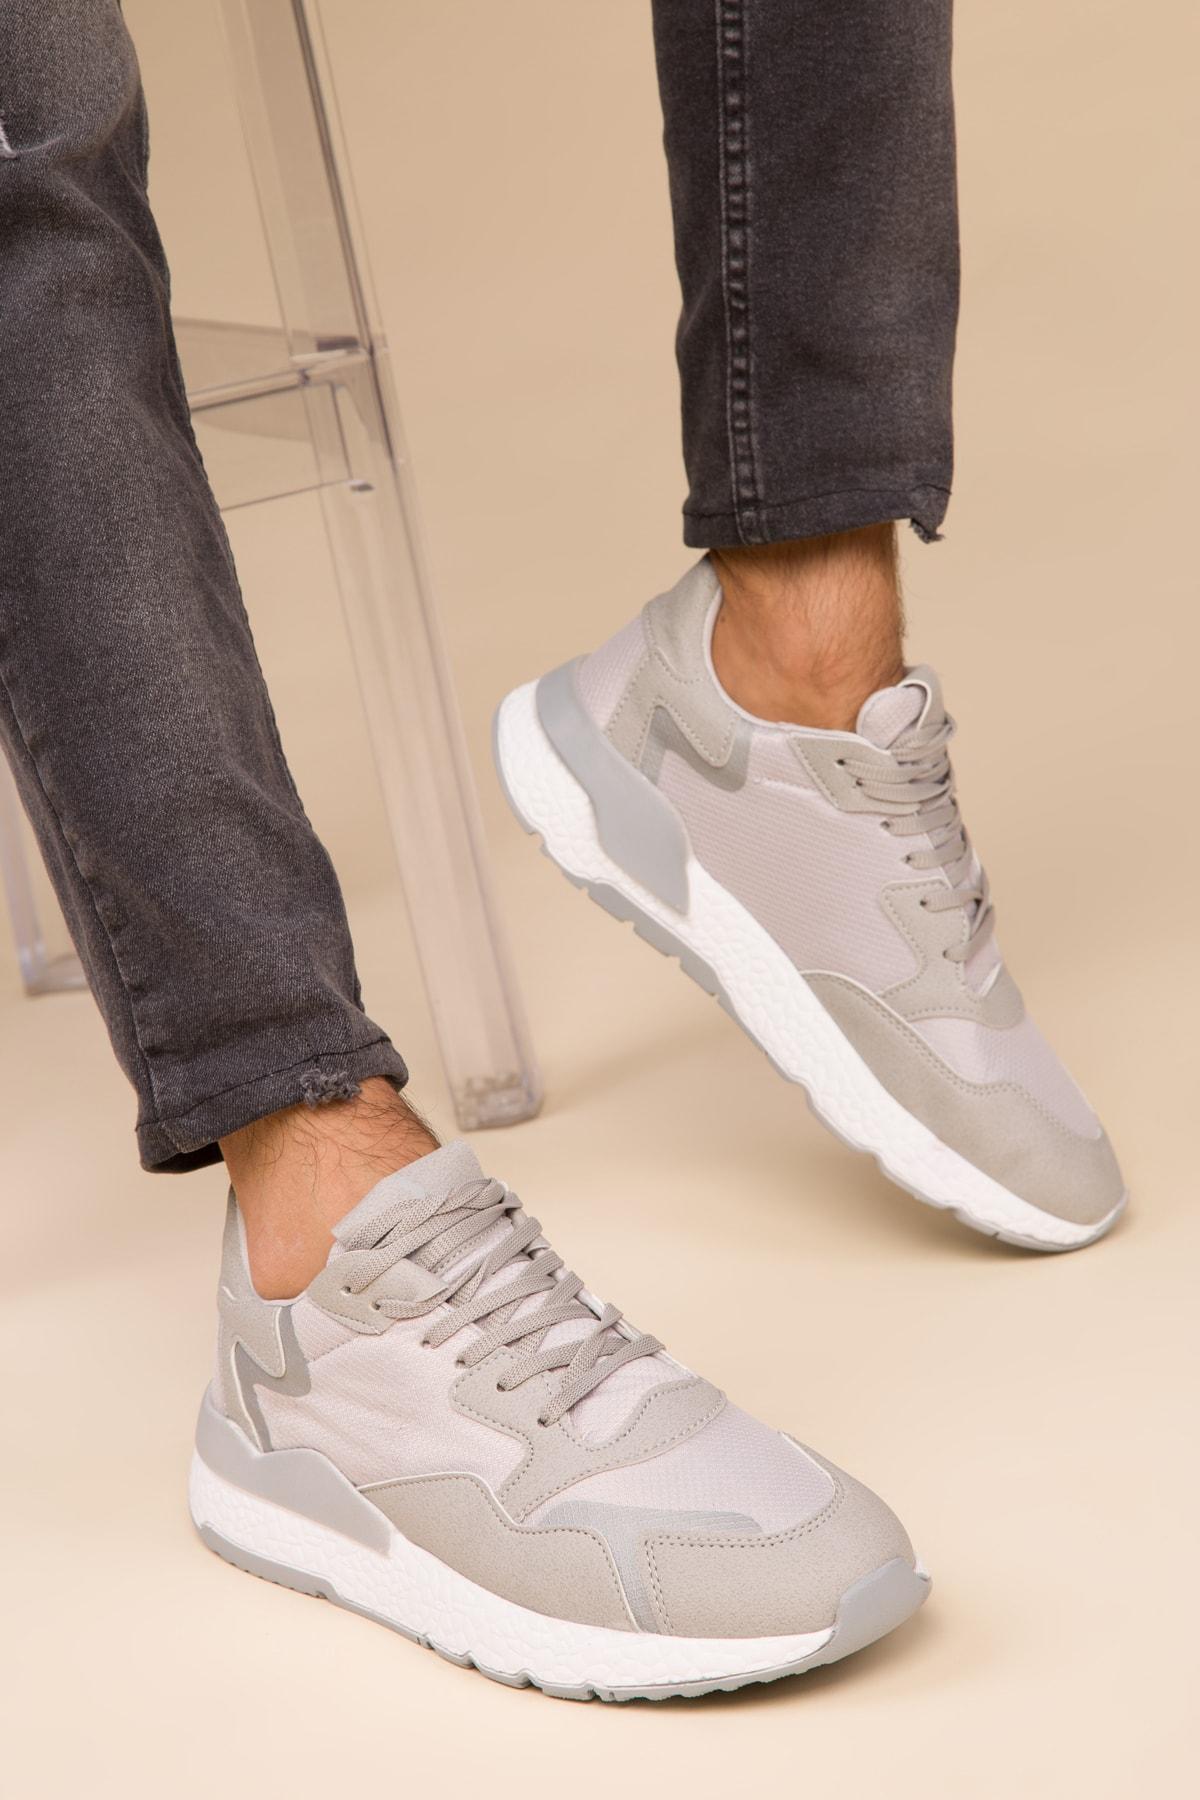 Soho-Men Buz Erkek Sneaker 3034 1